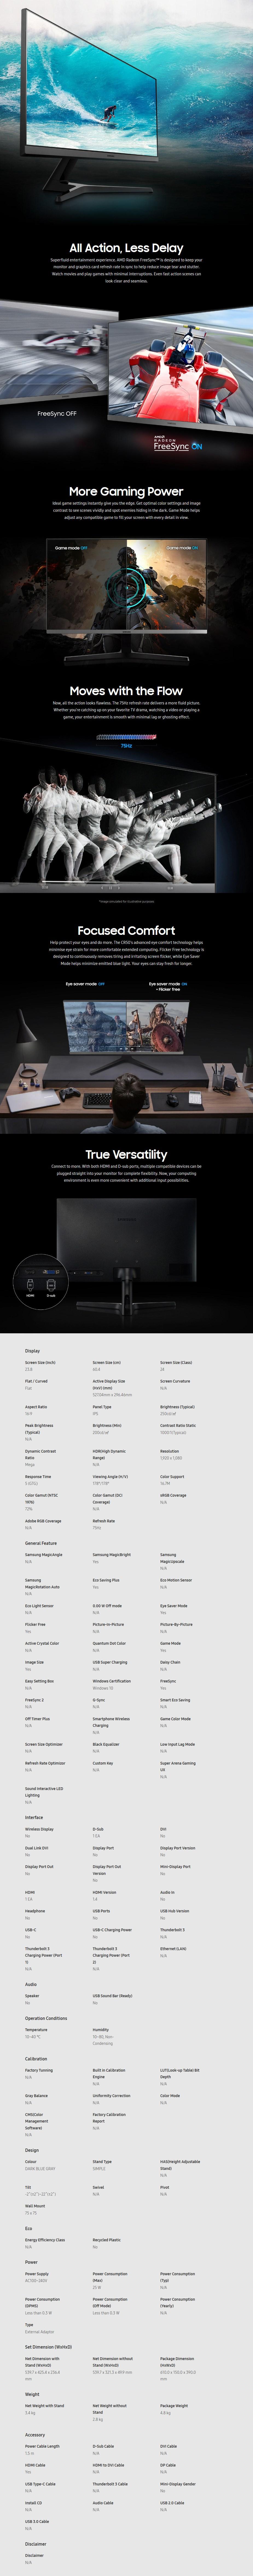 "Samsung SR350 23.8"" 75Hz Full HD FreeSync IPS Monitor - Overview 1"